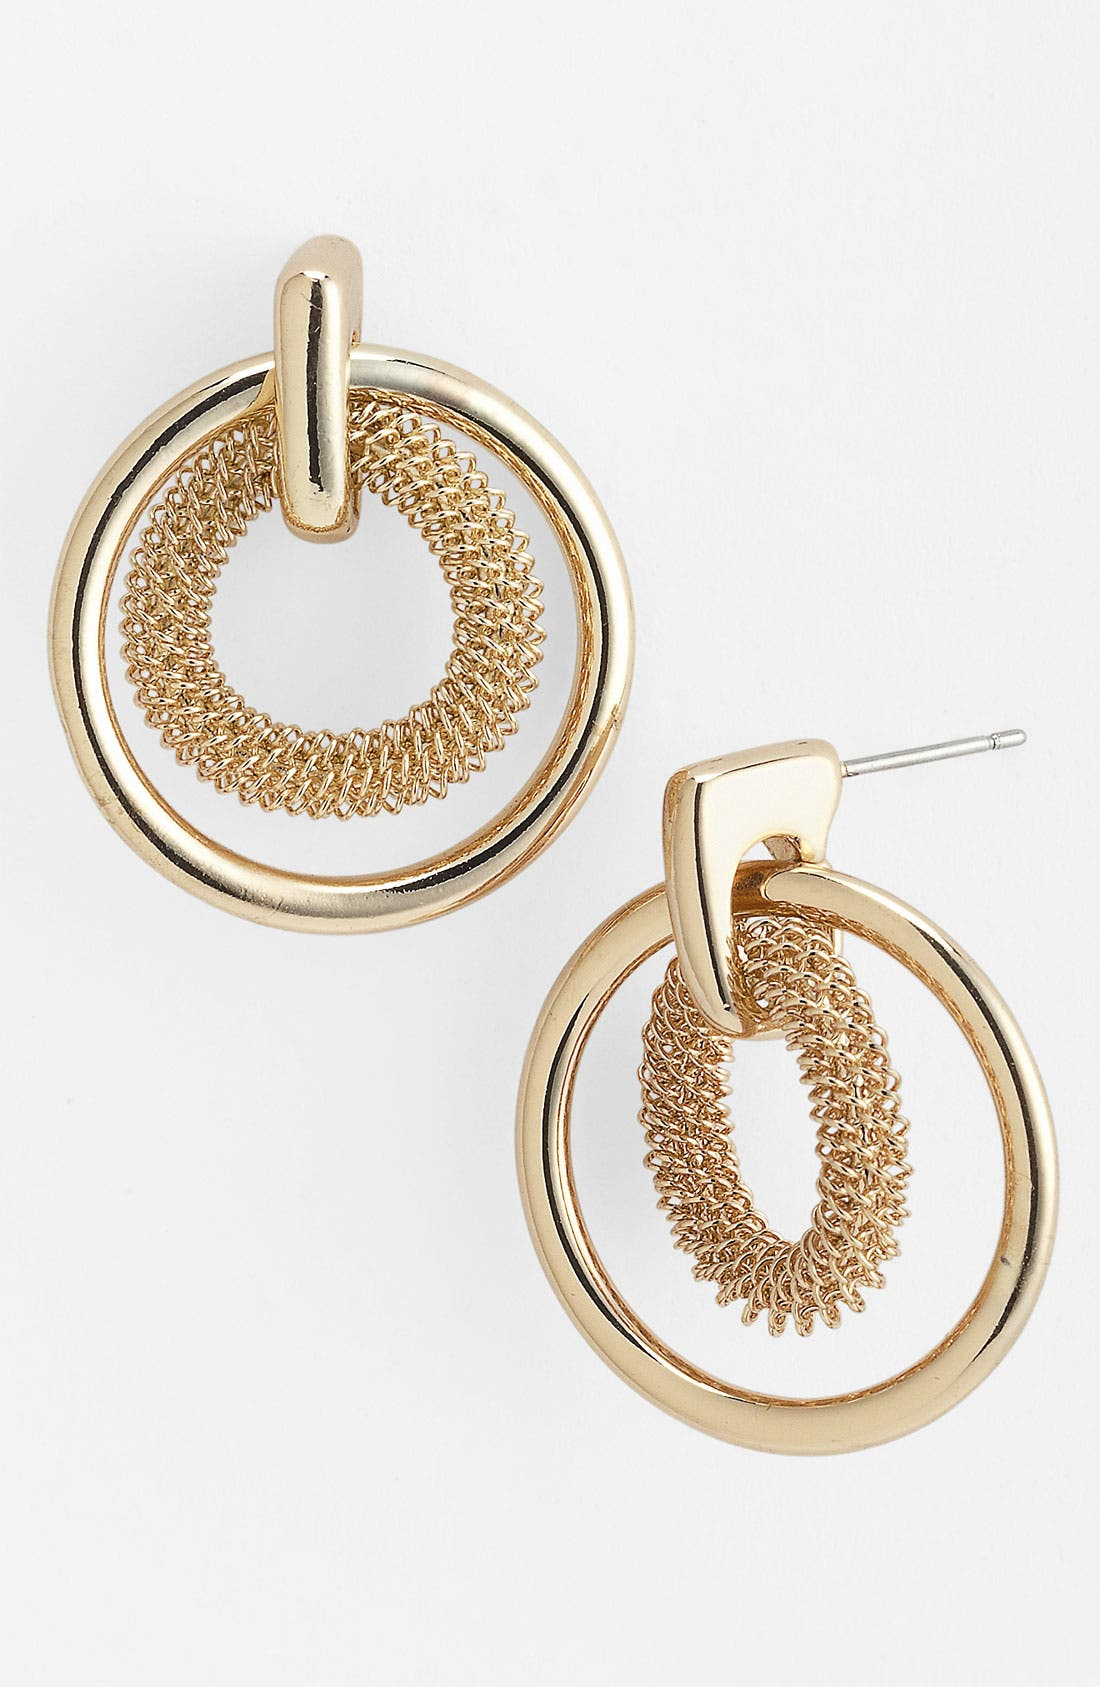 Main Image - Anne Klein Door Knocker Earrings